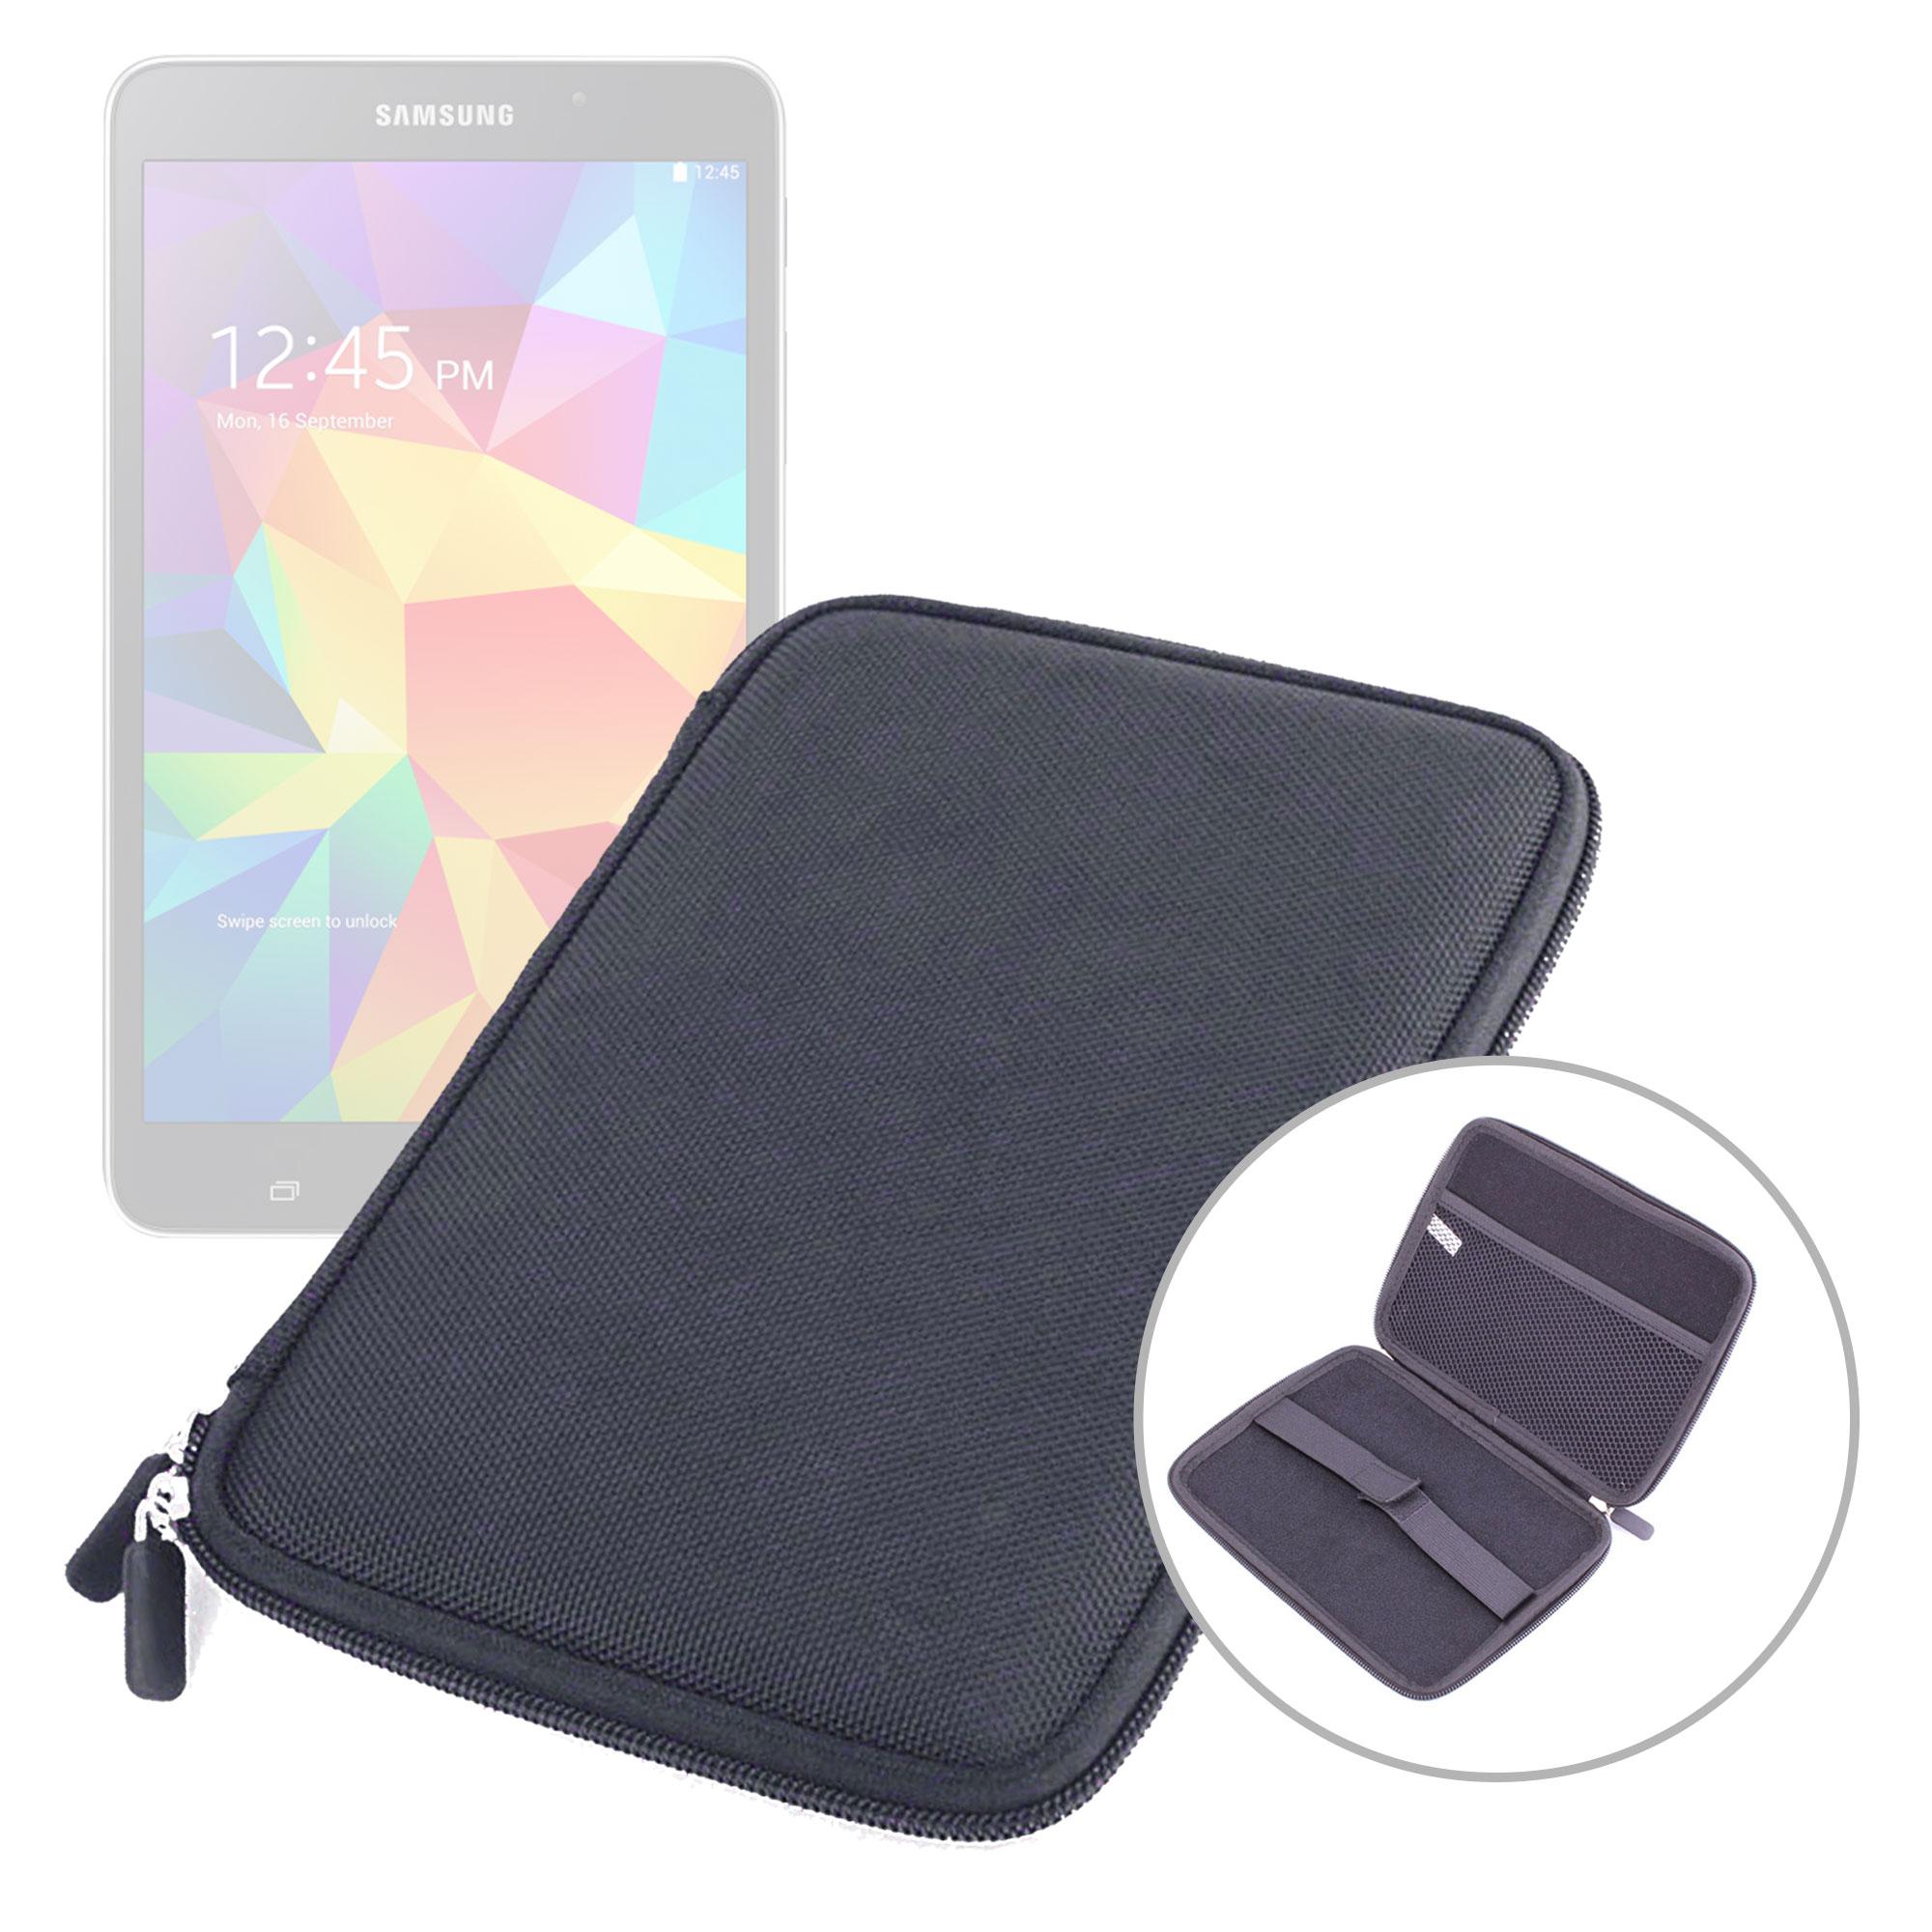 etui housse rigide noir pour tablette samsung galaxy tab 4. Black Bedroom Furniture Sets. Home Design Ideas